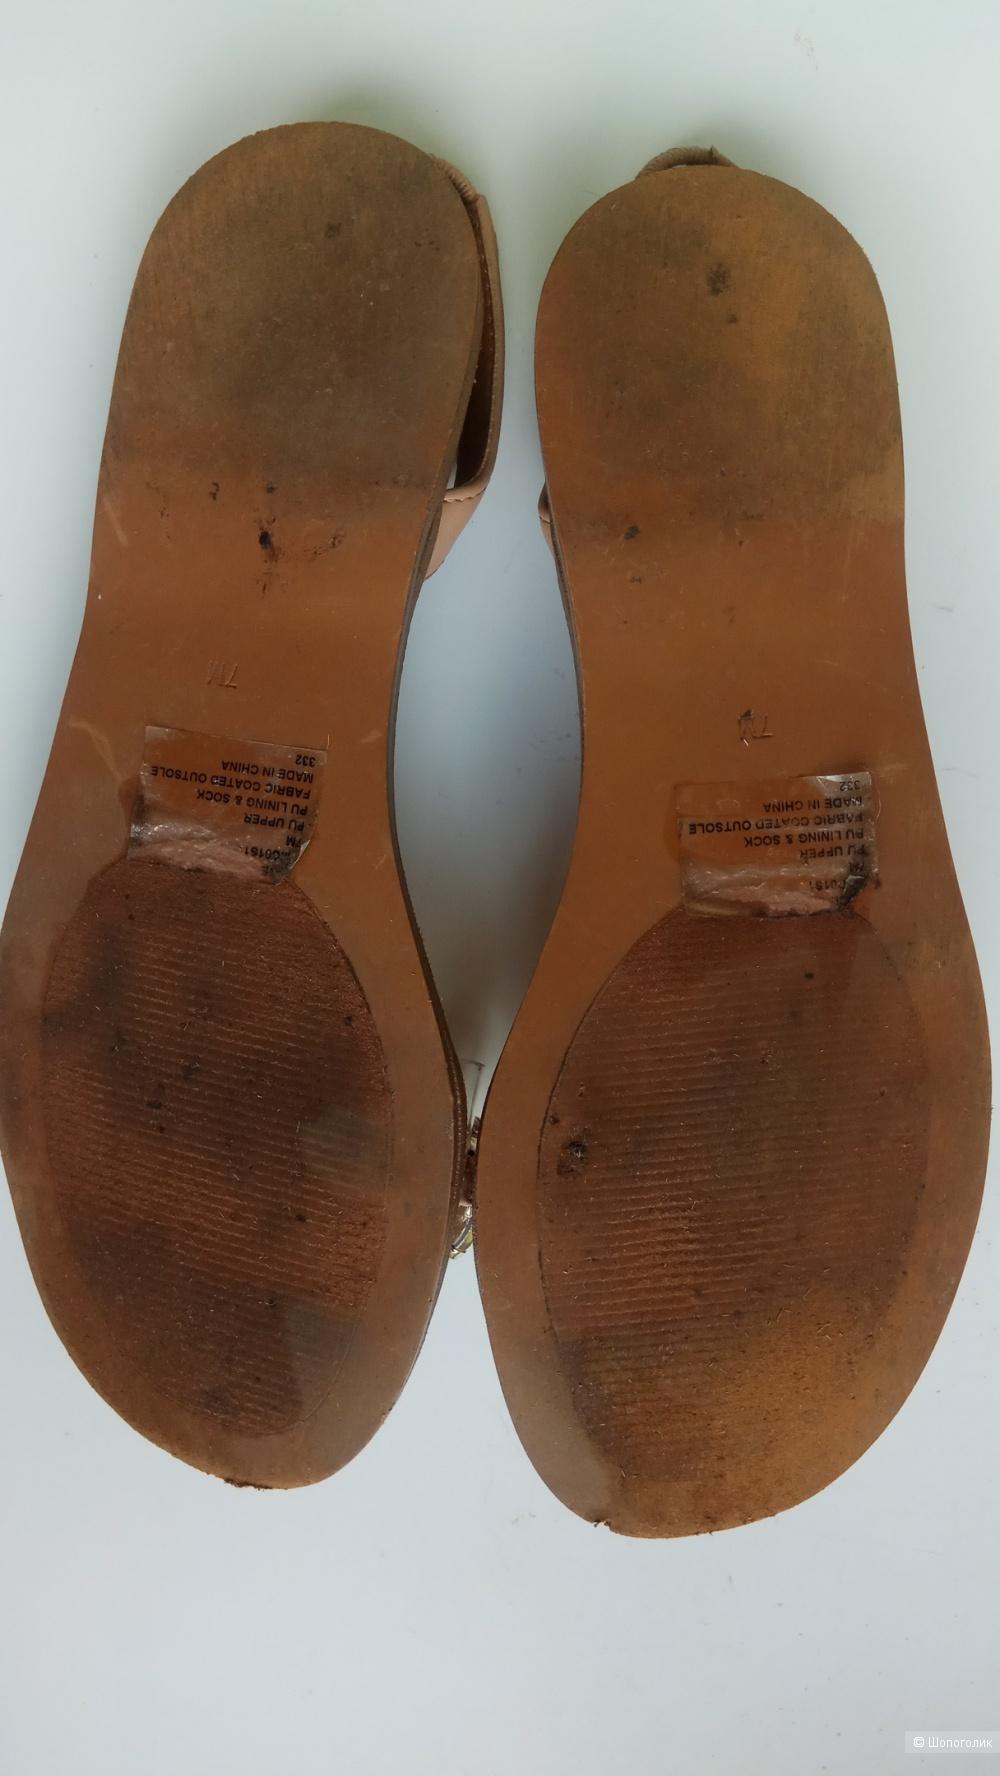 Steve Madden Jeweled Sandals   босоножки размер 7